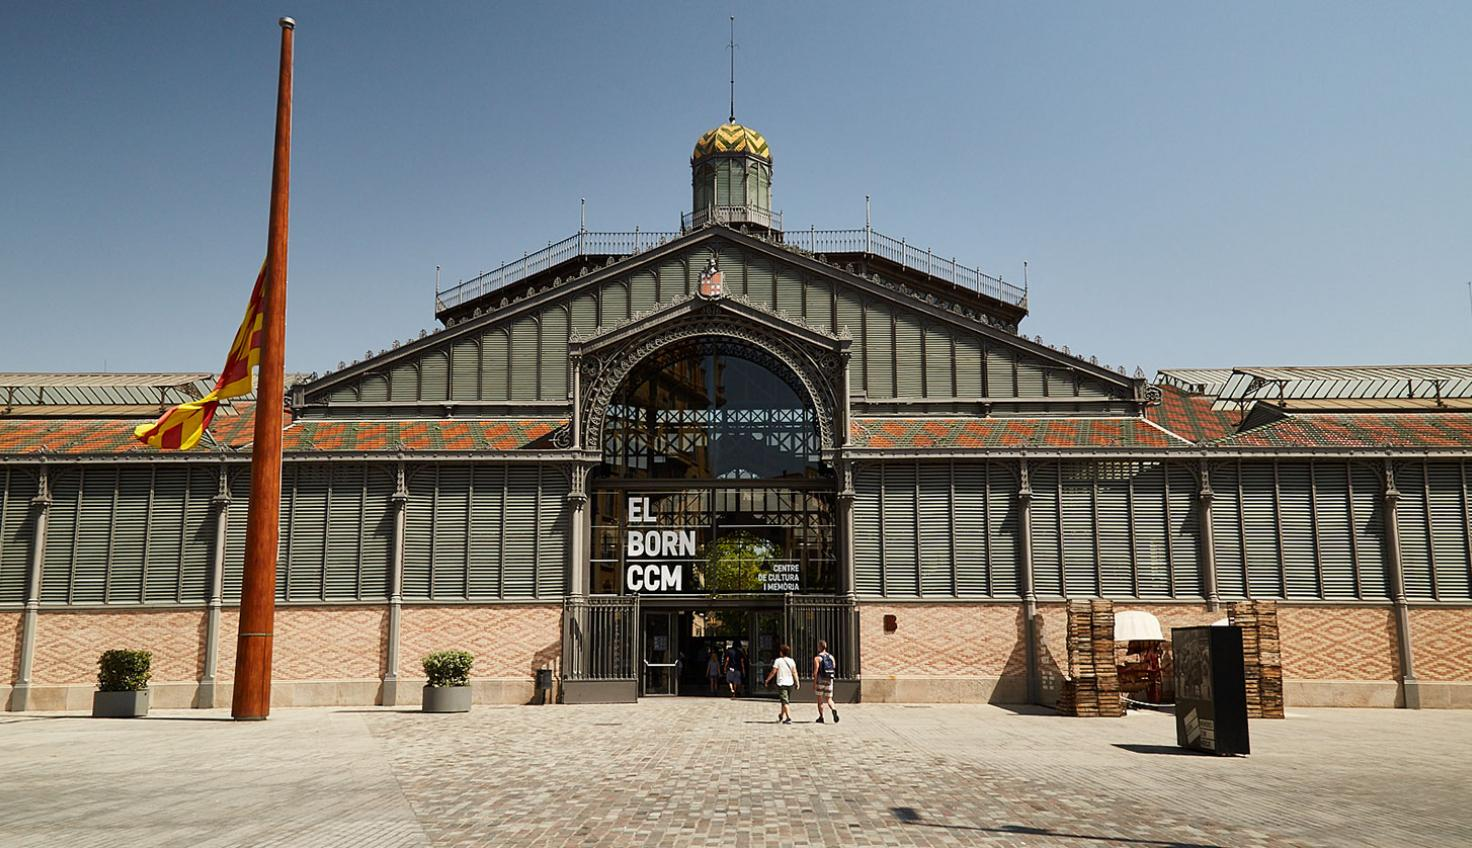 Alter Markt El Born - Kultur und Gedächtniszentrum El Born fotografie